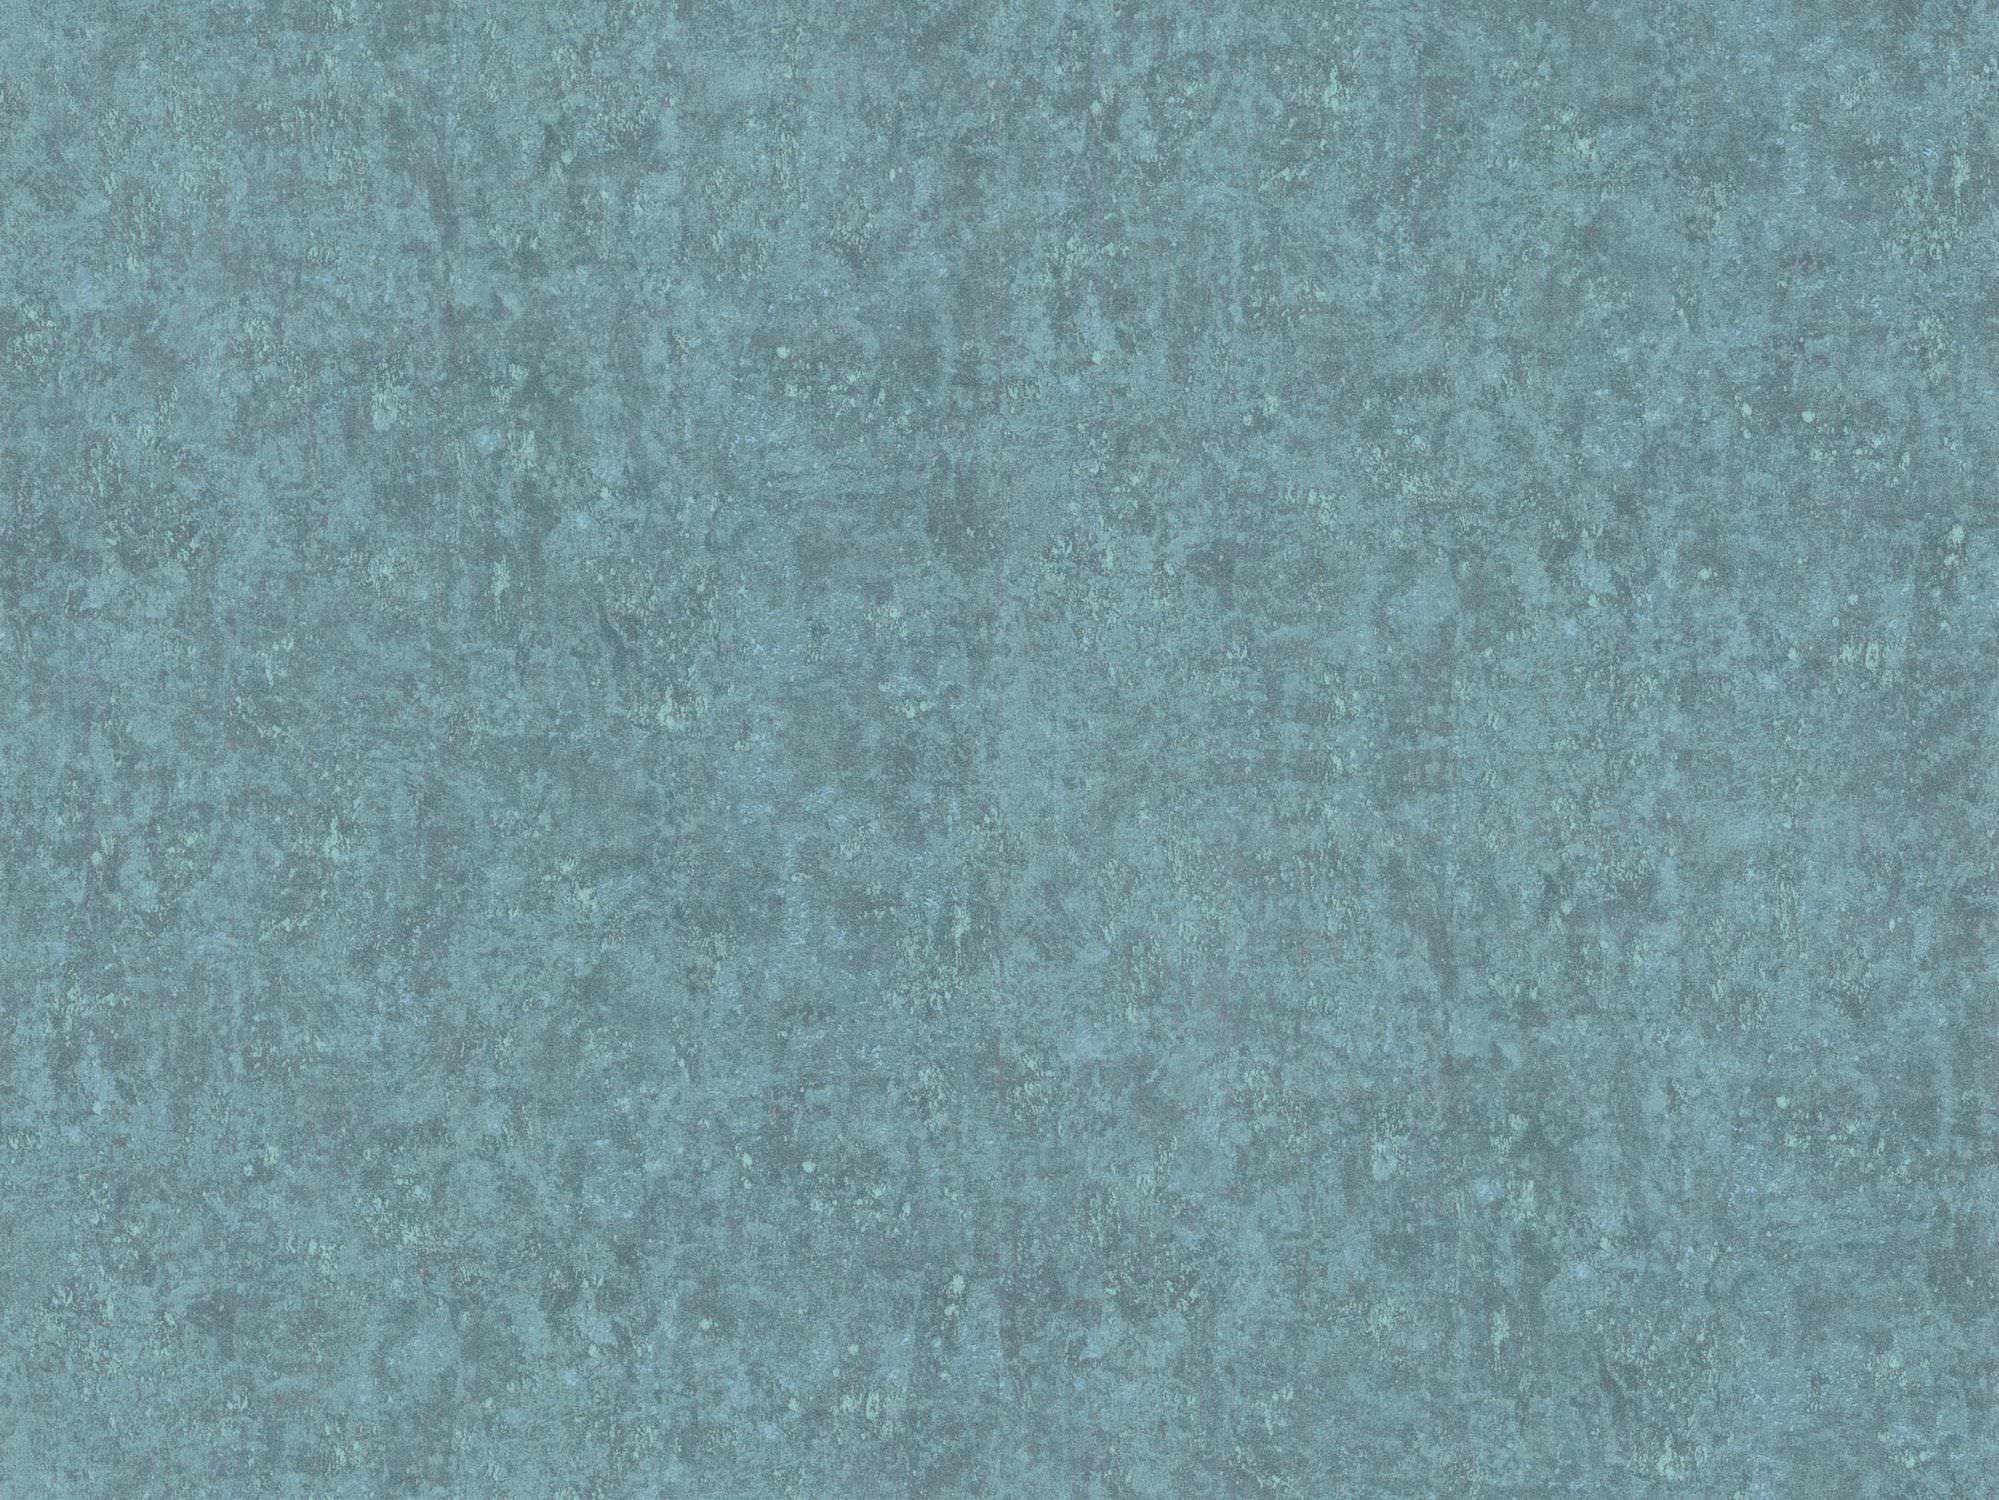 Contemporary wallpaper / vintage / plain / metallic 92/11049 SALVAGE  Cole&Son …